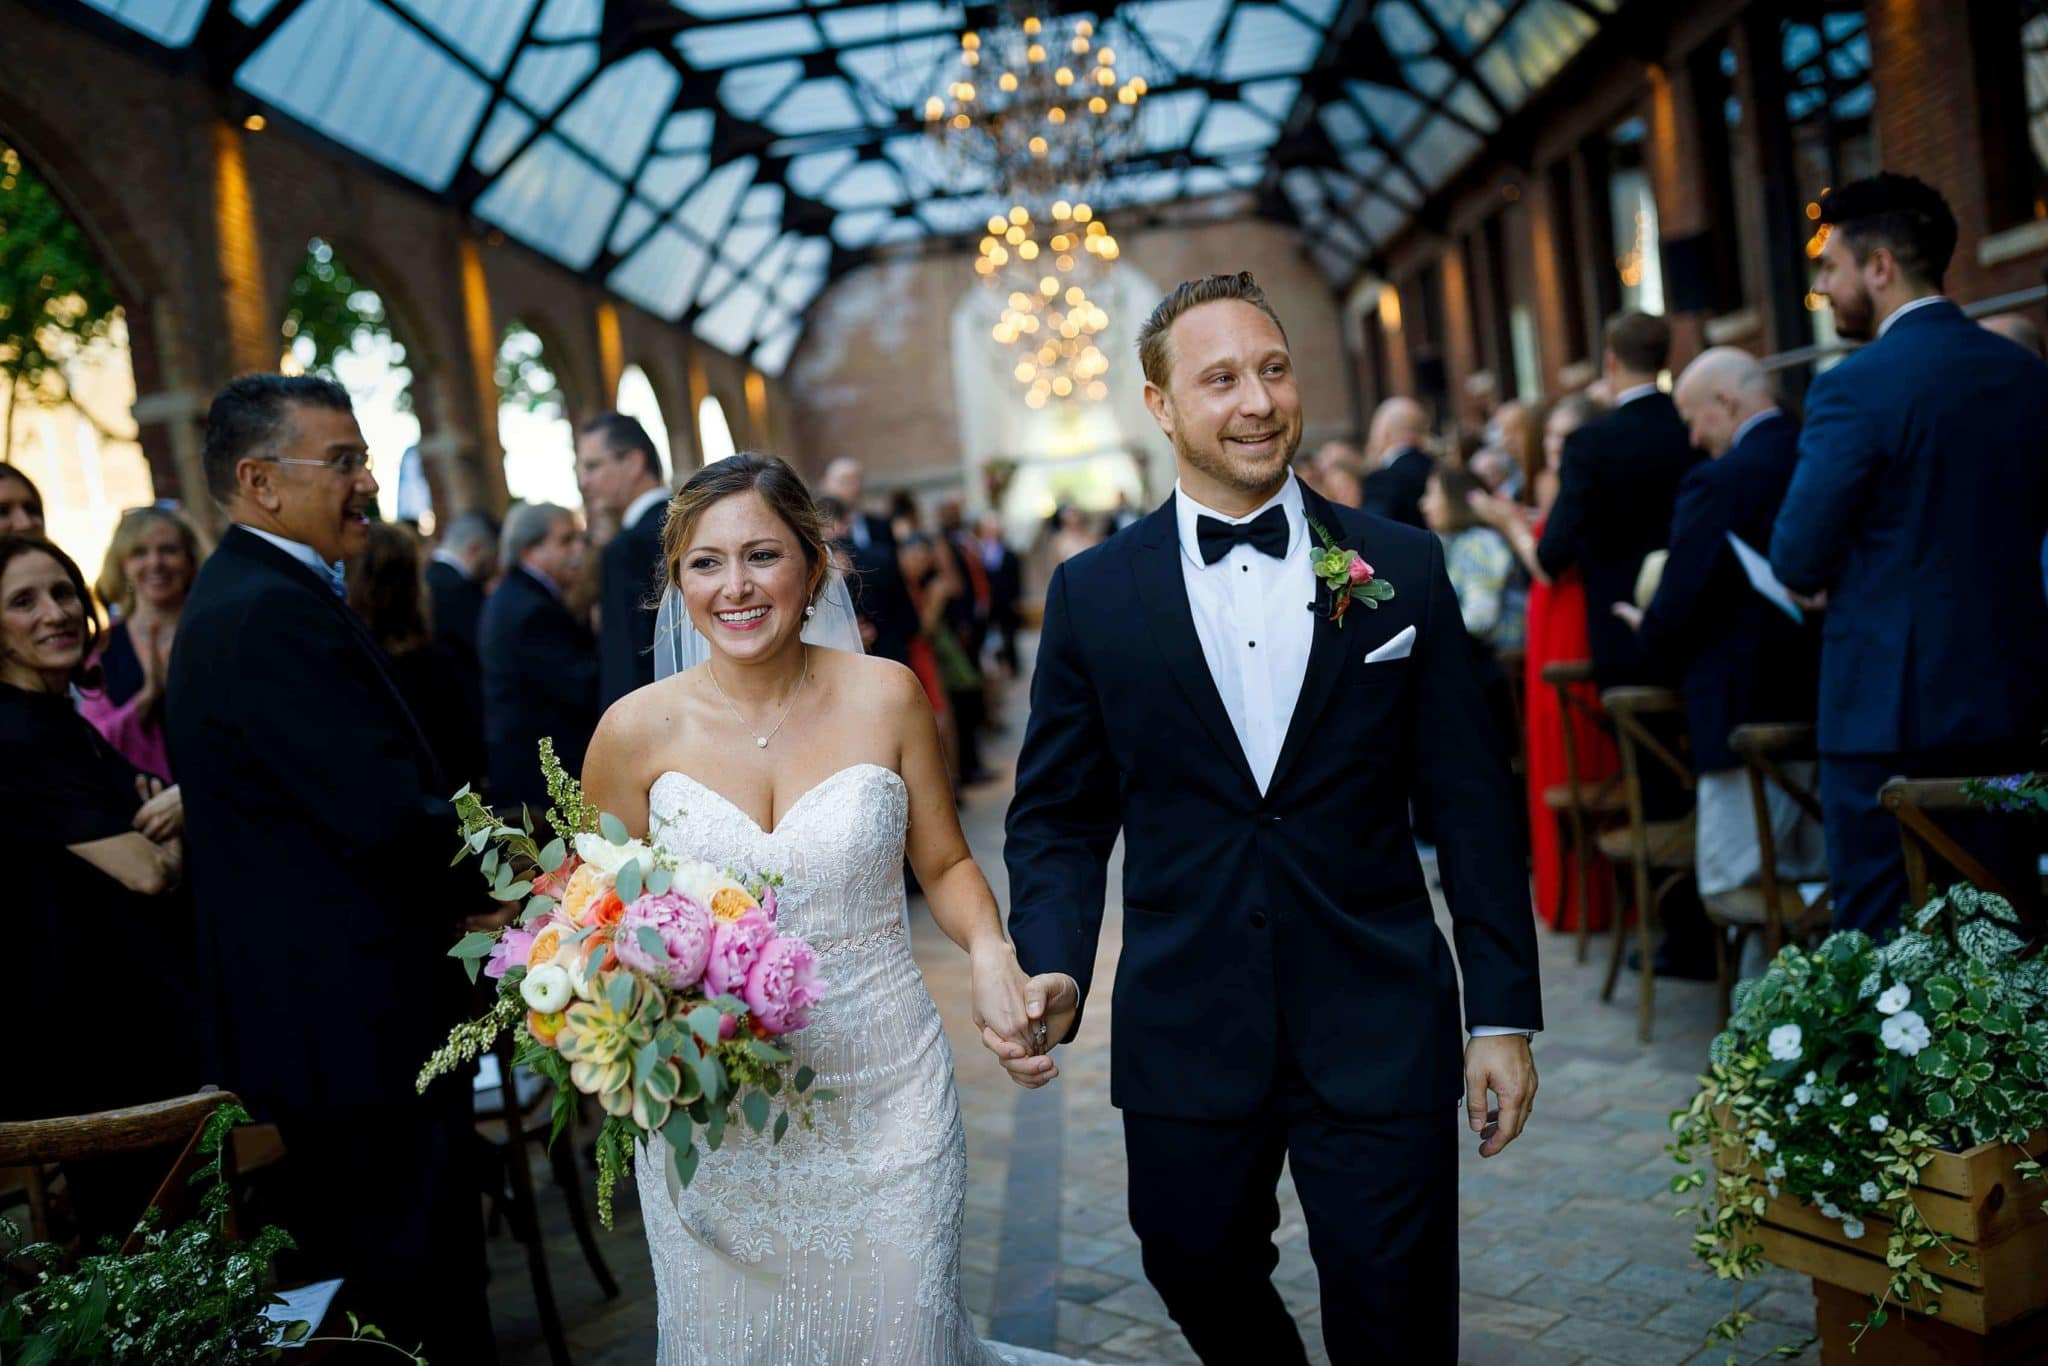 bride and groom walk back down the aisle after wedding ceremony at Bridgeport Art Center Sculpture Garden in Chicago